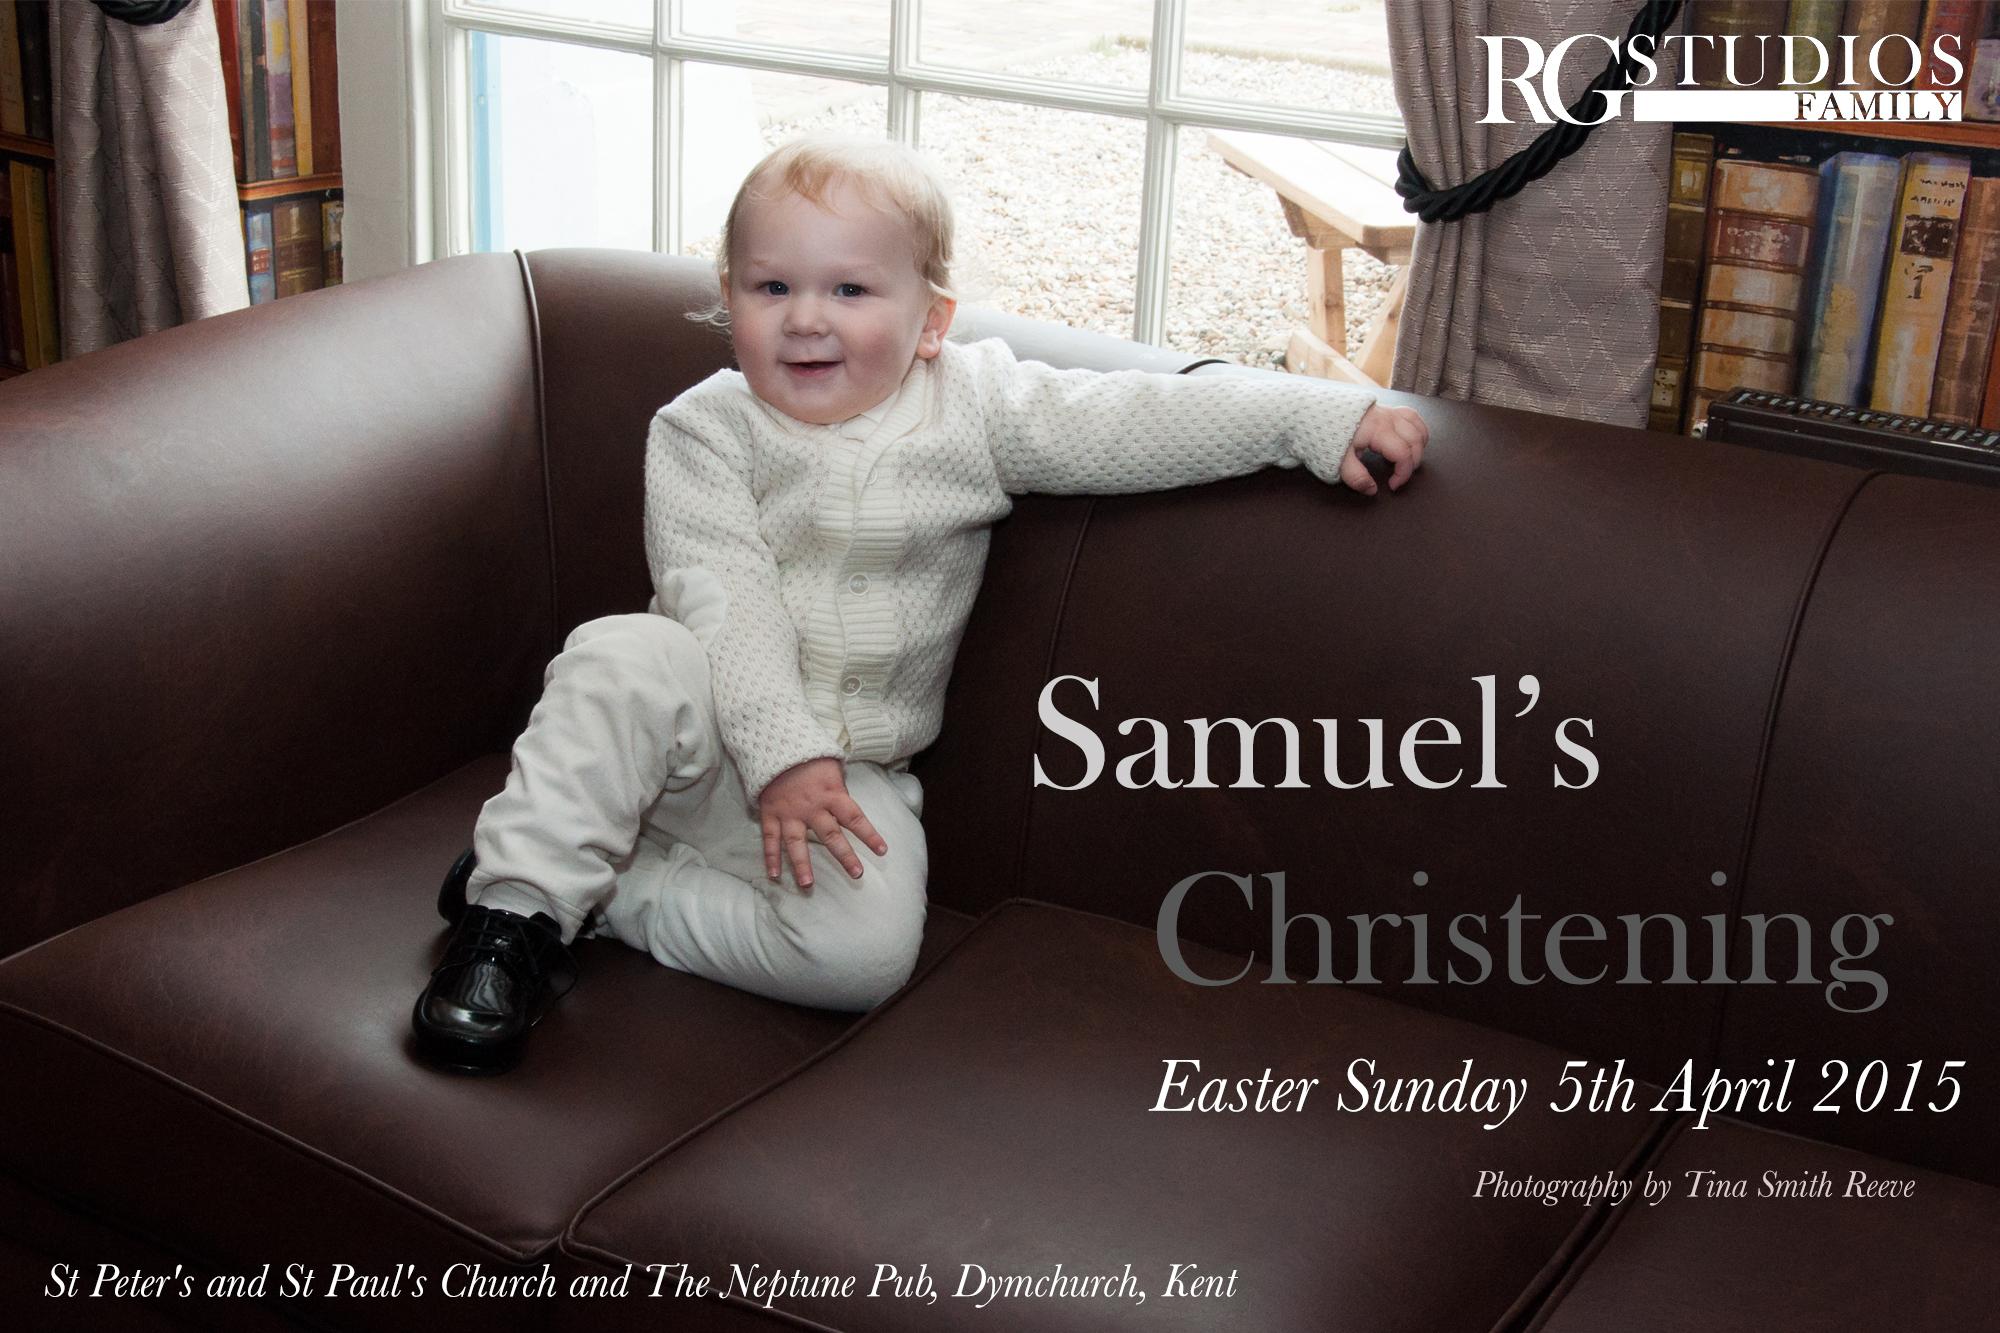 Samuels Christening